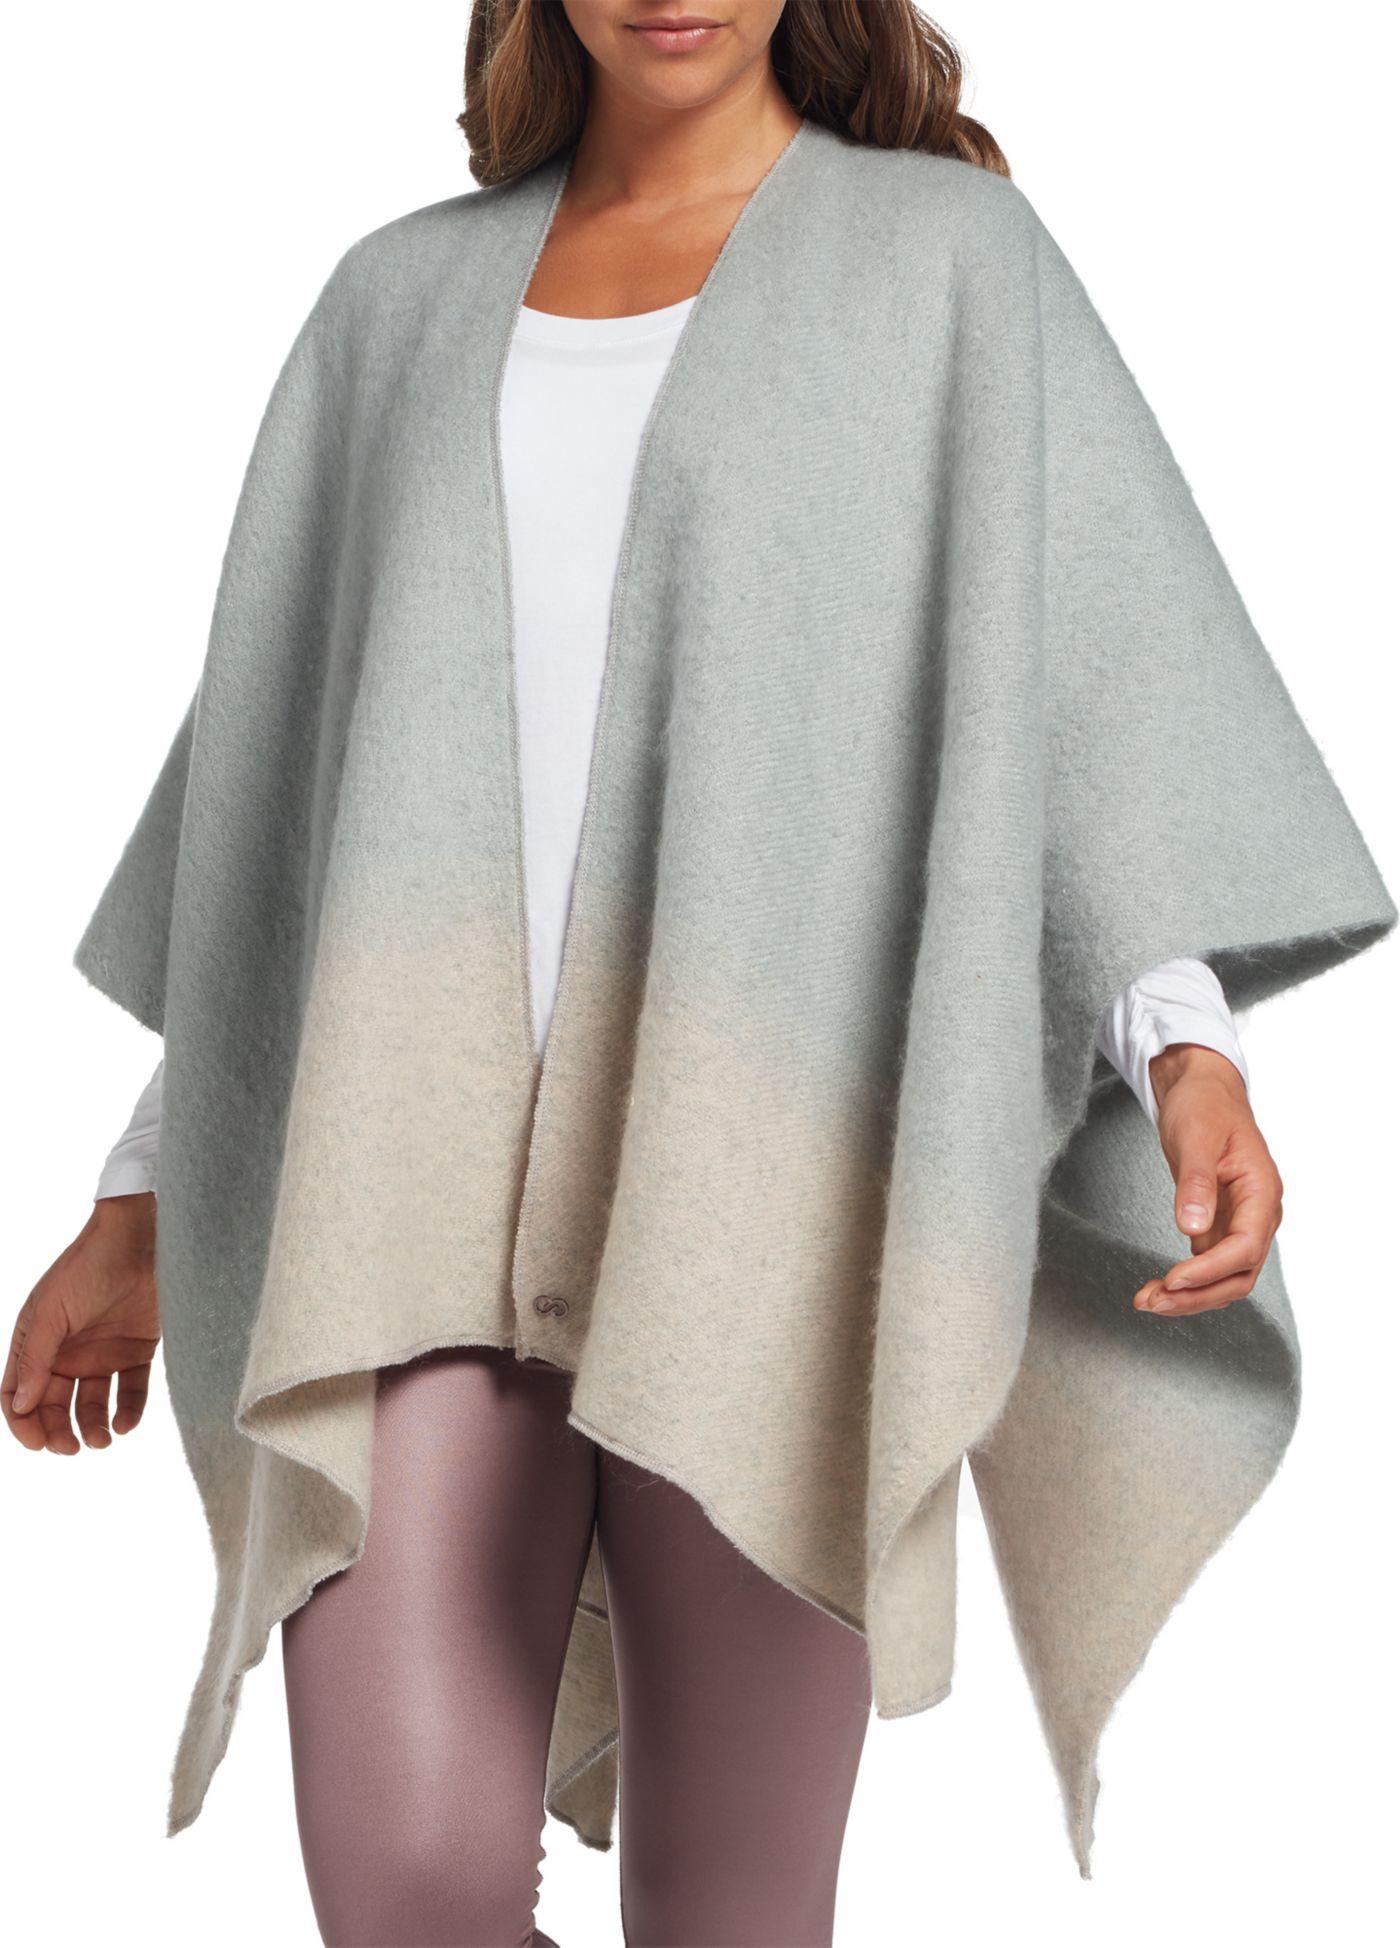 CALIA by Carrie Underwood Women's Ombre Wrap